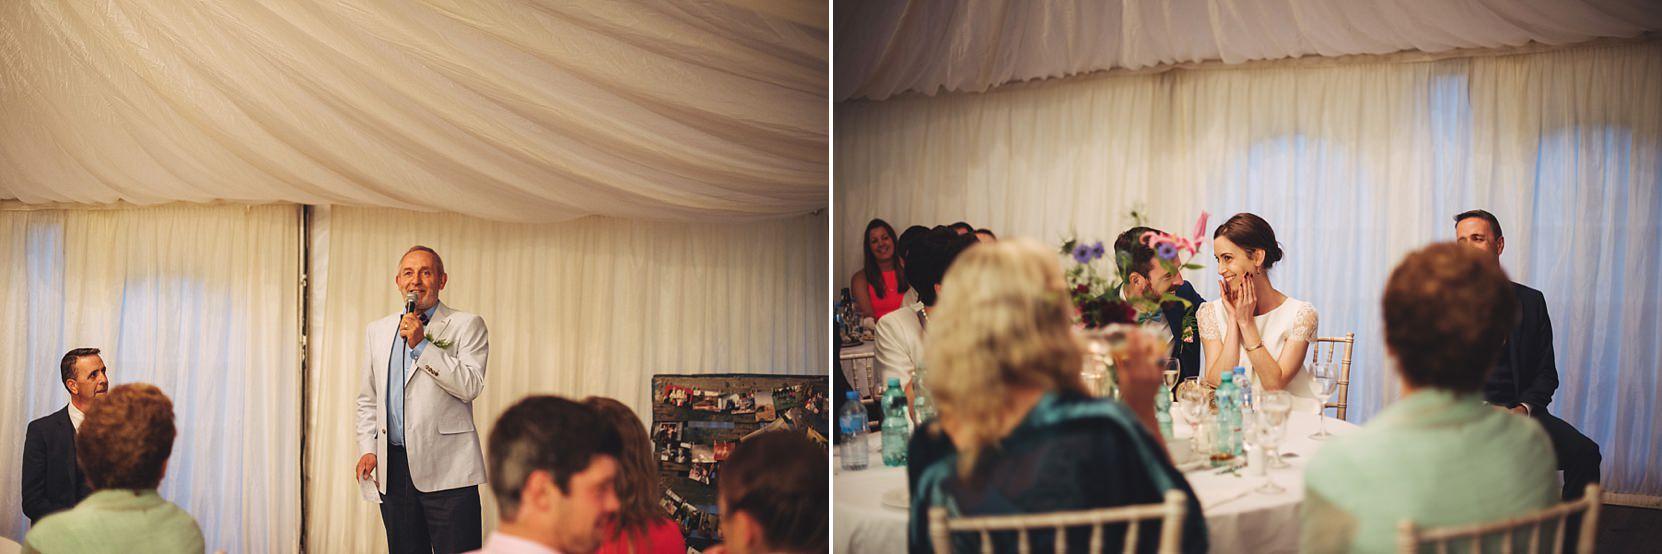 DIY-Wedding-_0178